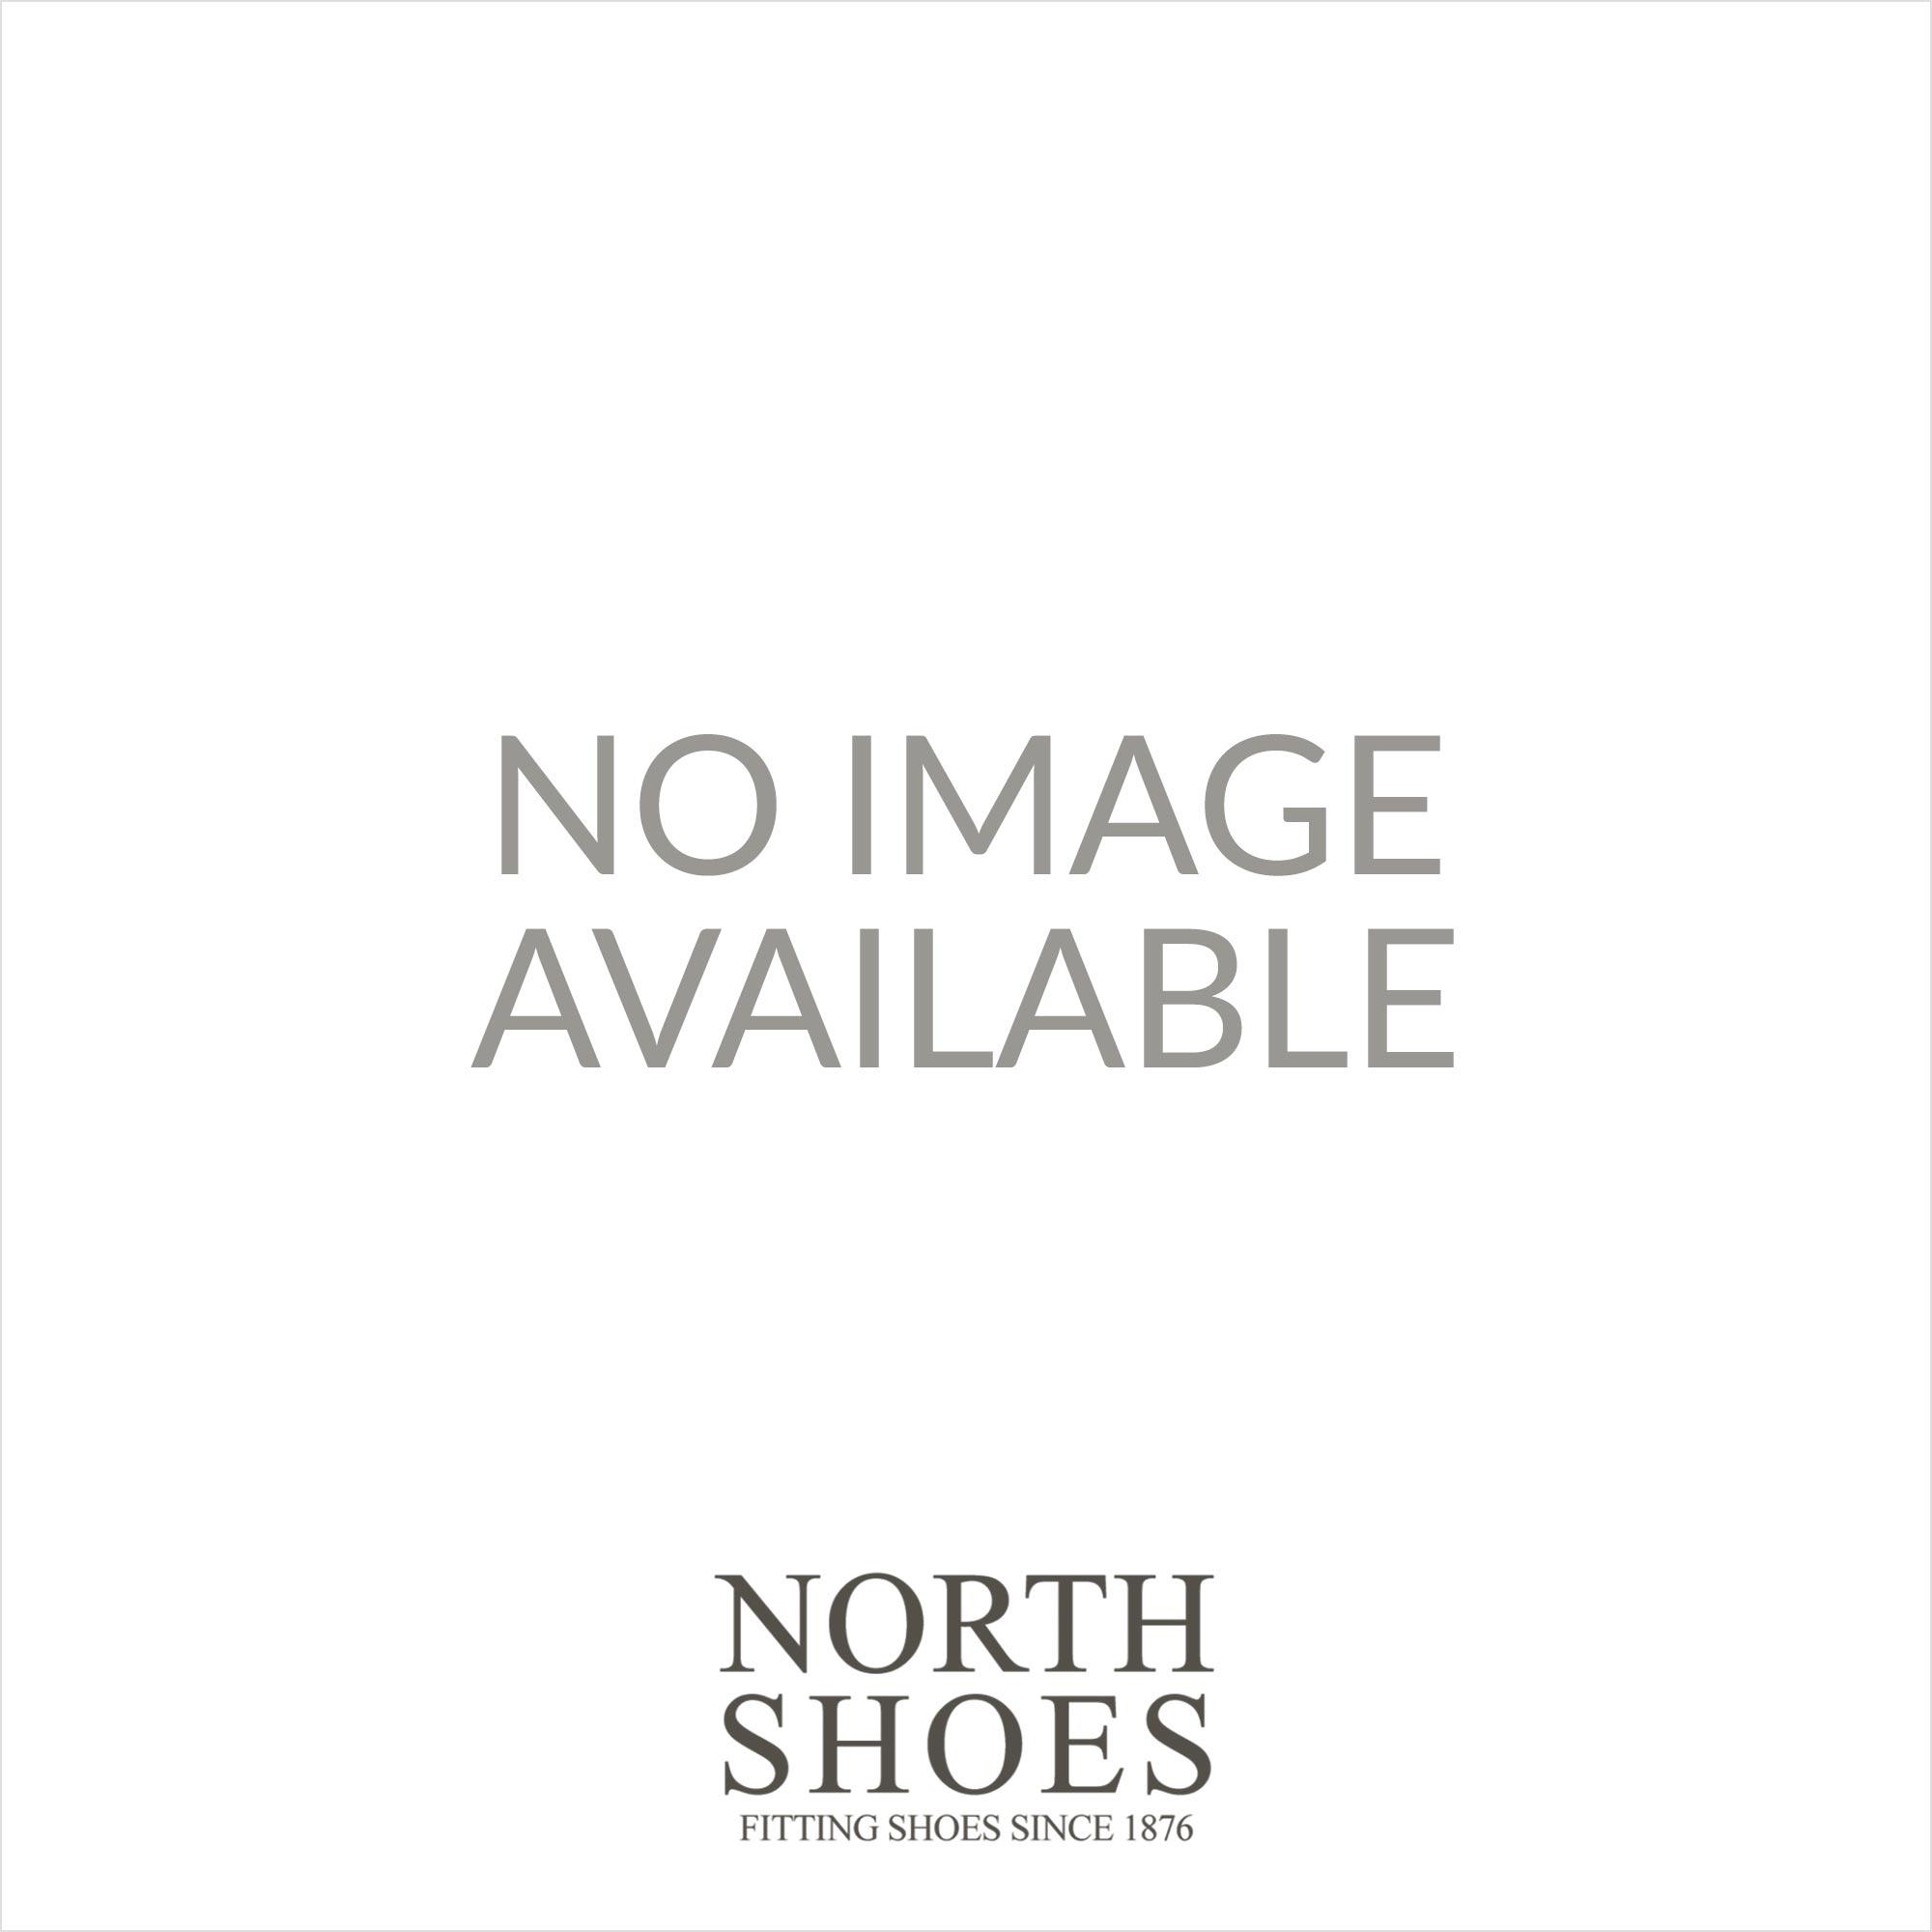 87620e6f8c47 Skechers Burst - Very Daring 12735 Black Knitted Mesh Womens Slip On Casual  Trainer Shoe - UK 4 - Skechers from North Shoes UK